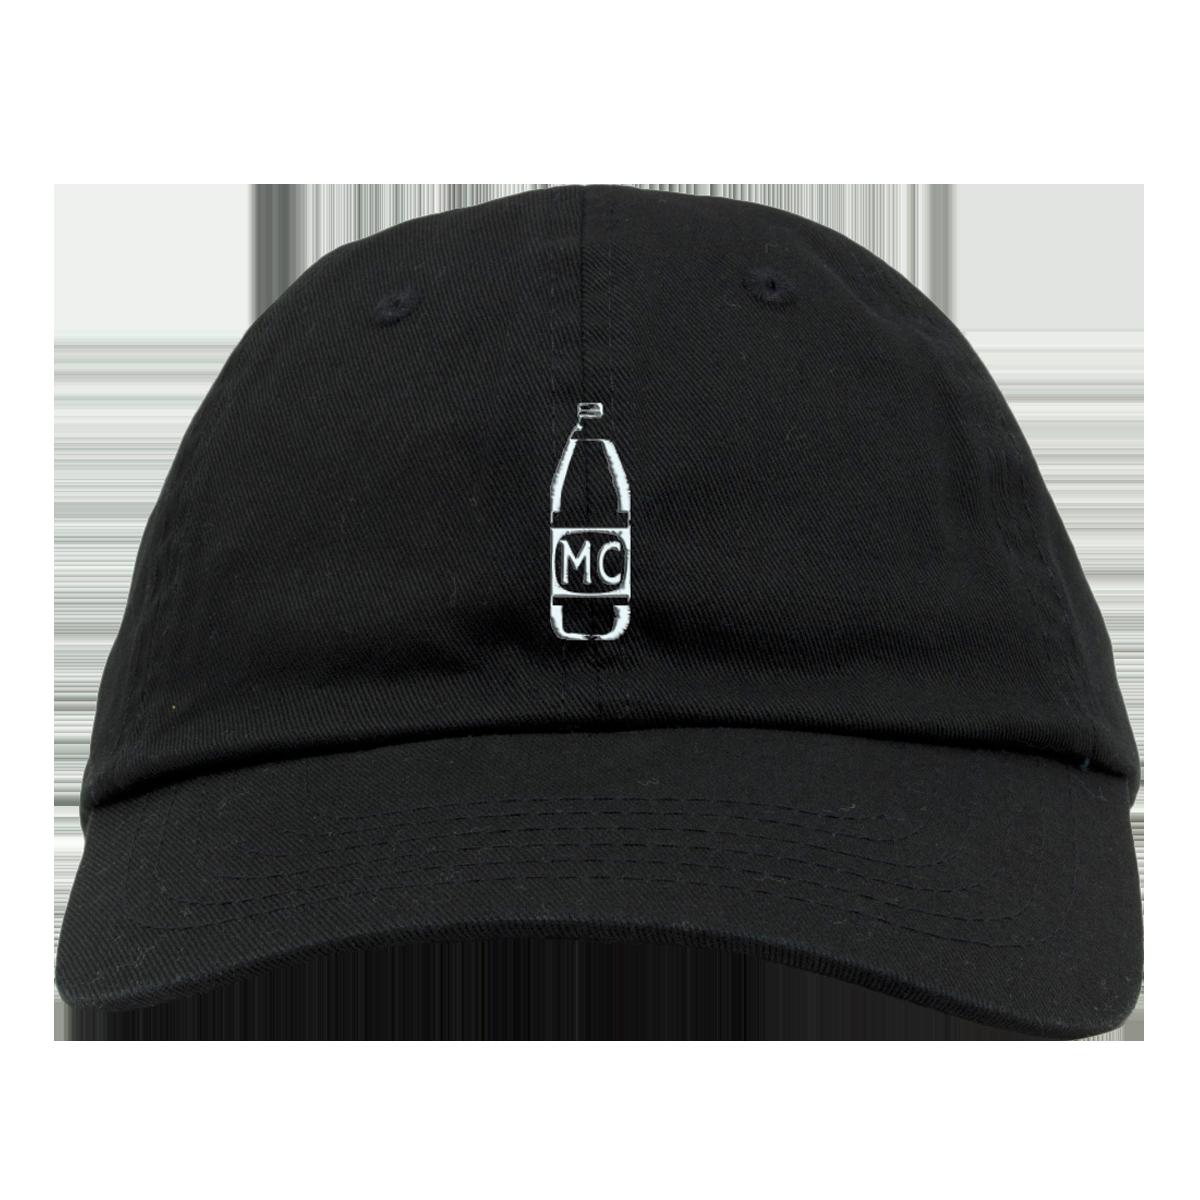 Craft 40 oz. Dad Hat